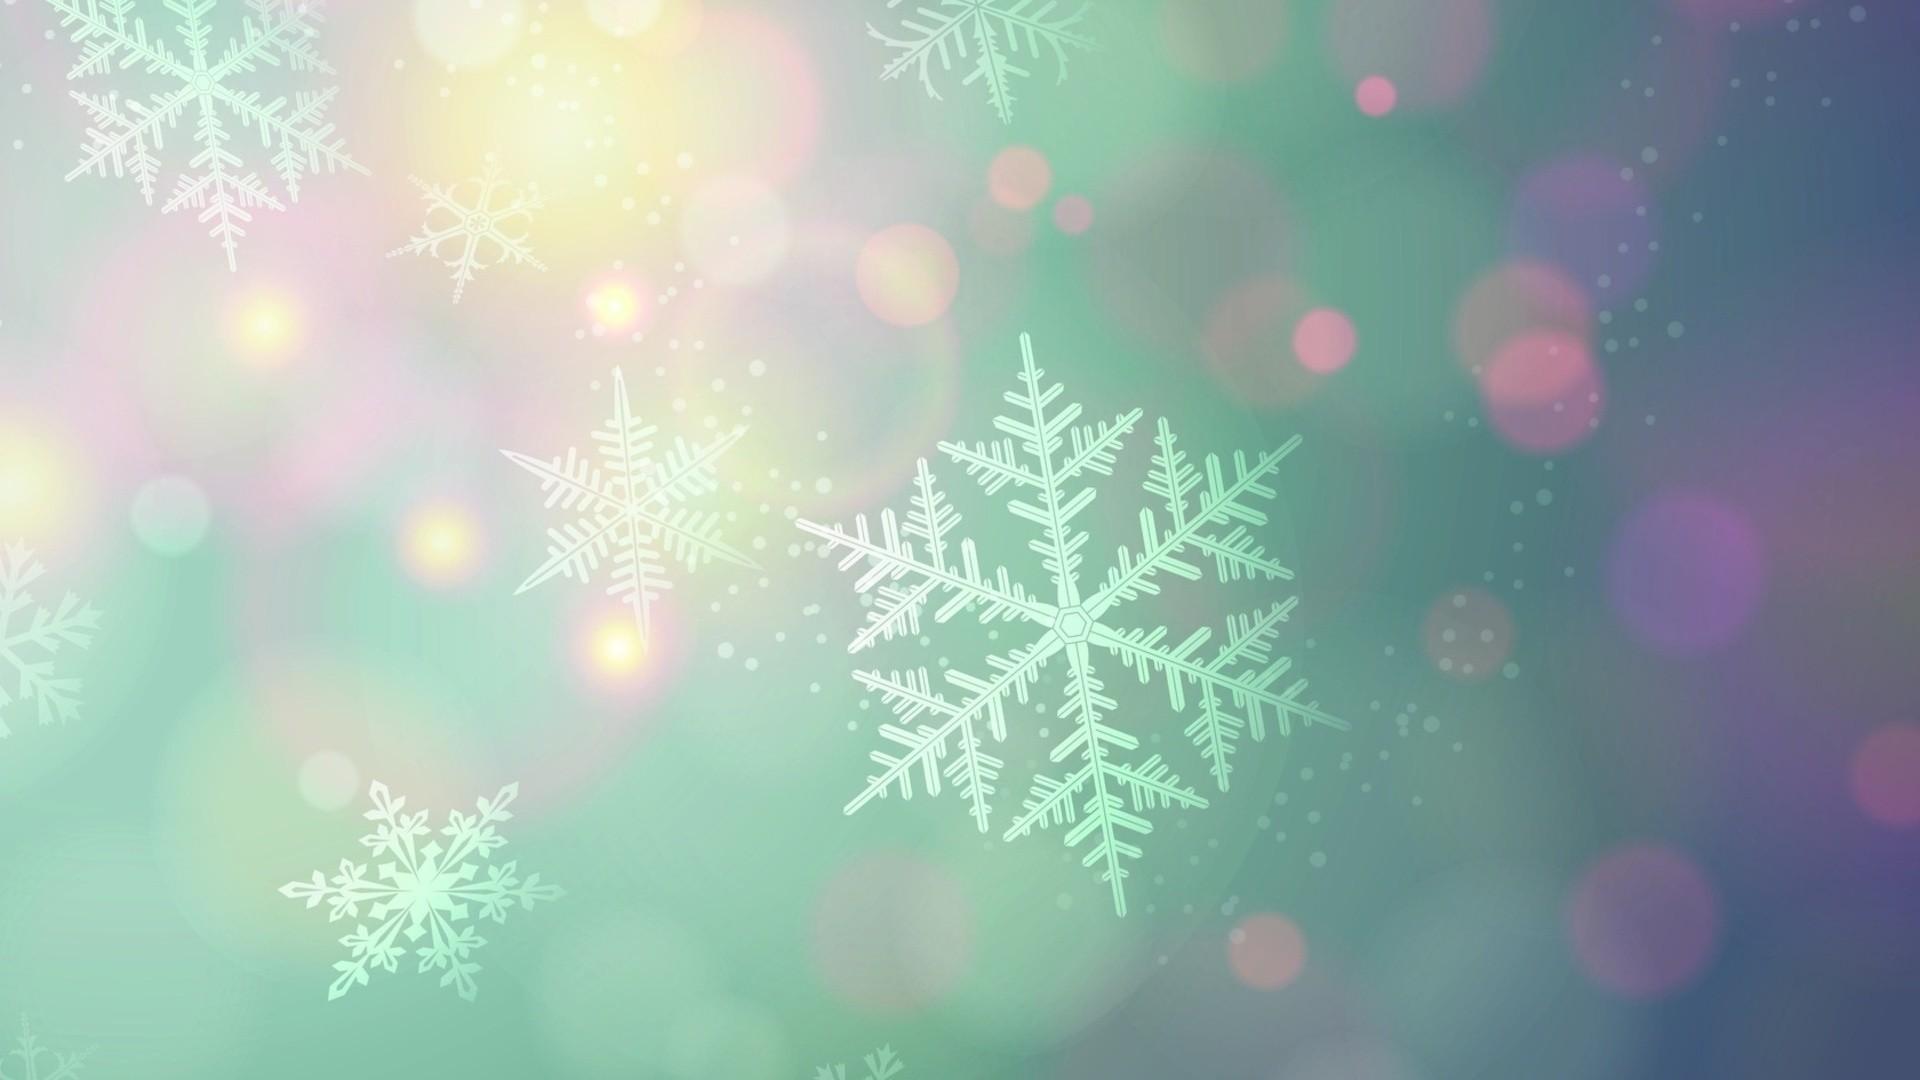 Res: 1920x1080, Snowflakes HD Wallpaper  Snowflakes ...